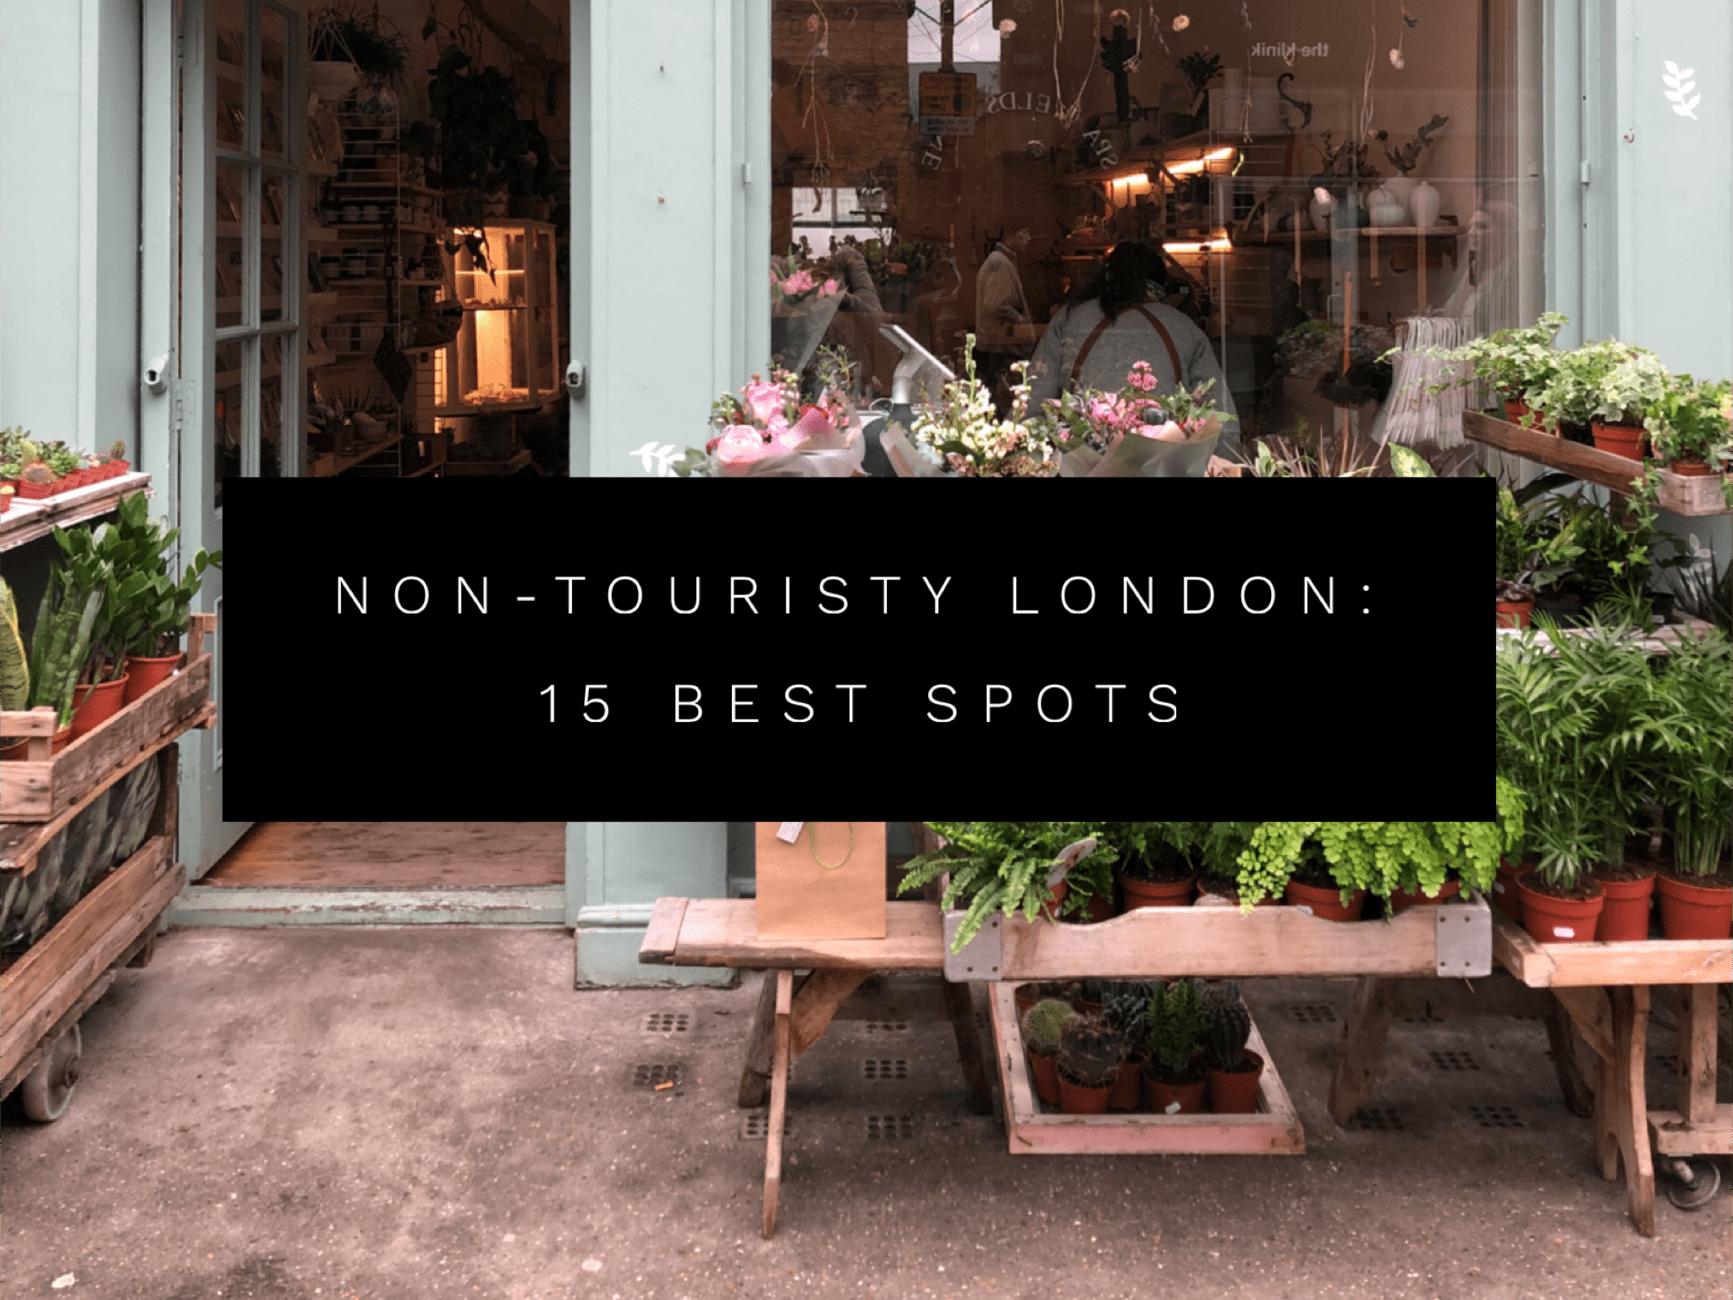 Non-touristy London: 15 best off the beaten path spots in London